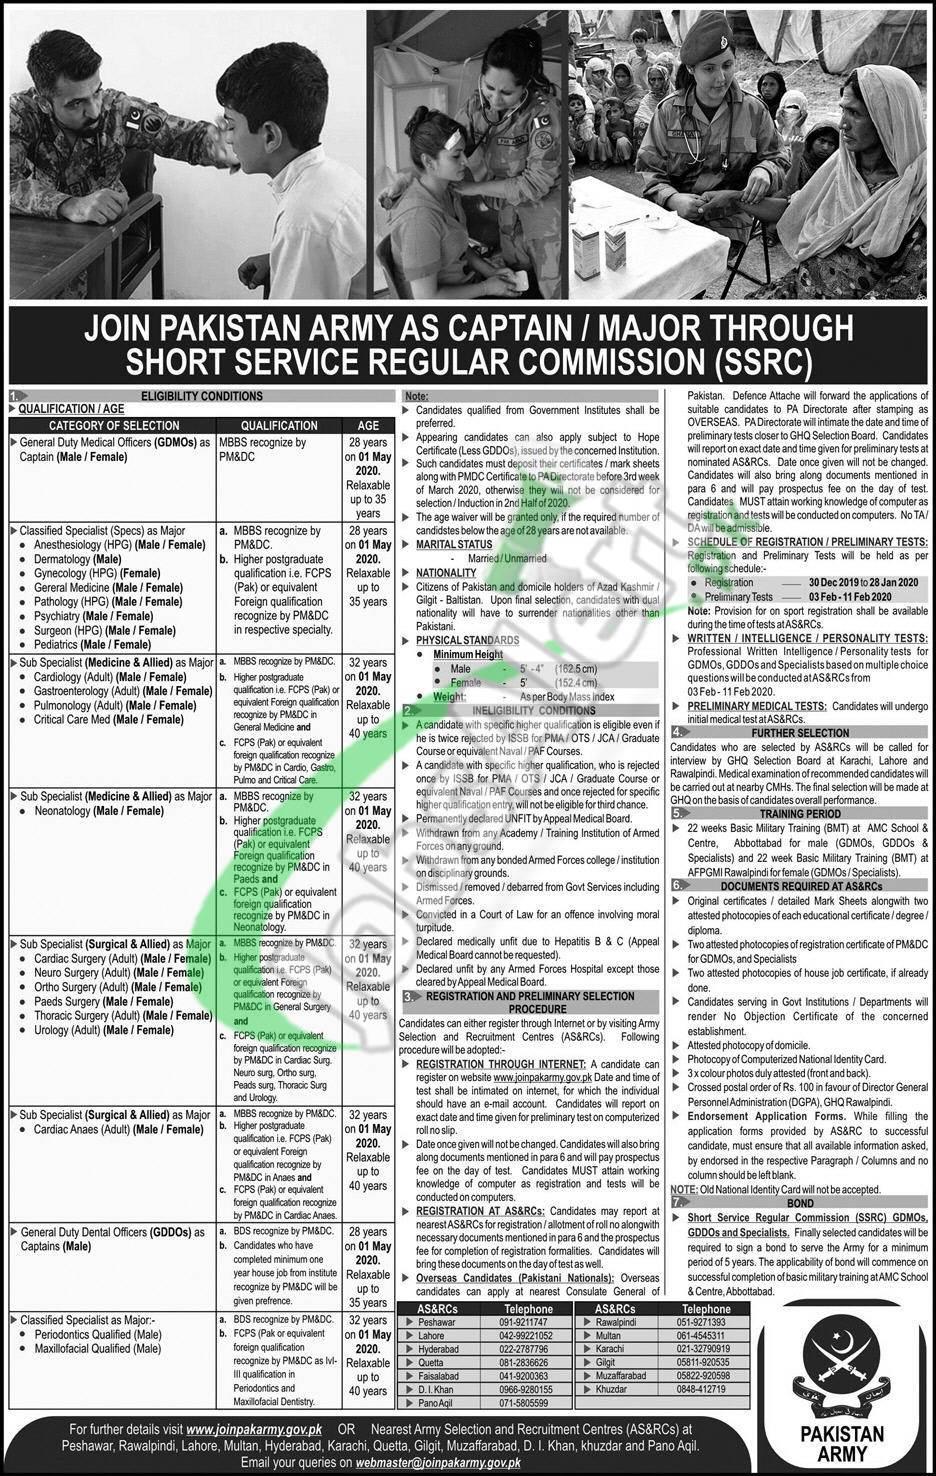 Join Pakistan Army As Captain/Major